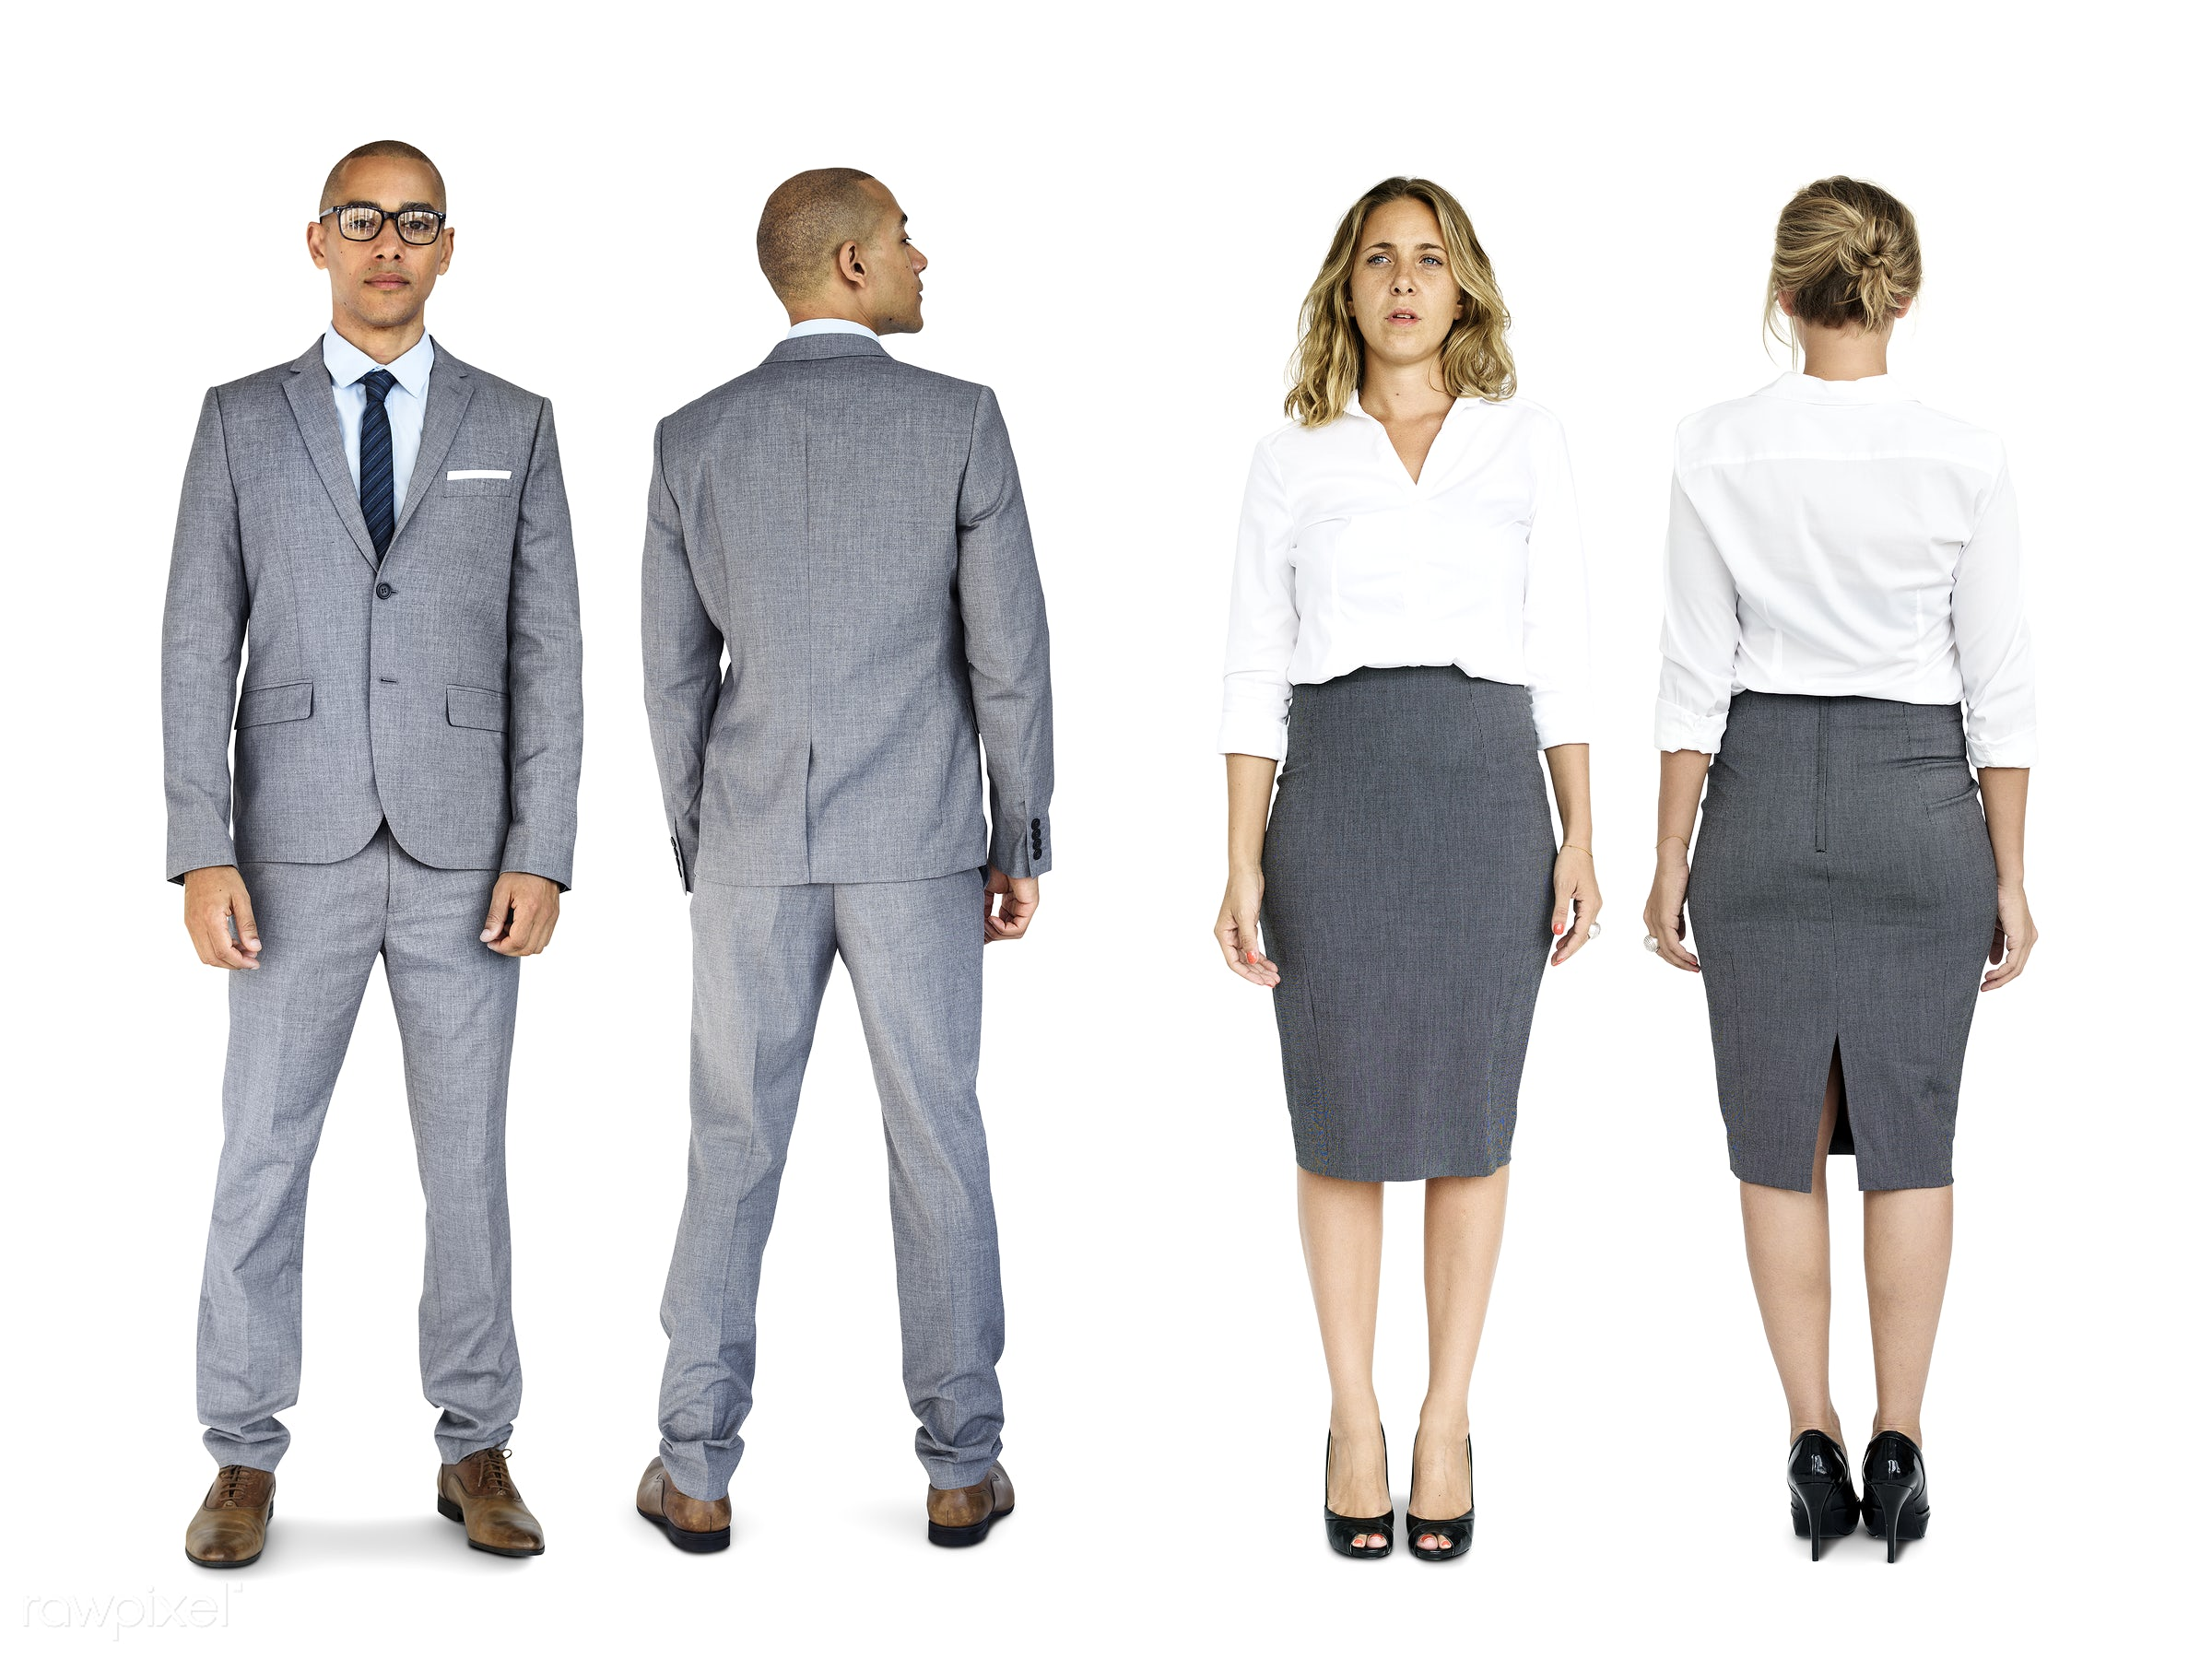 Diverse people set - adult, african descent, asian, business, businessman, businessmen, businesswoman, businesswomen, career...